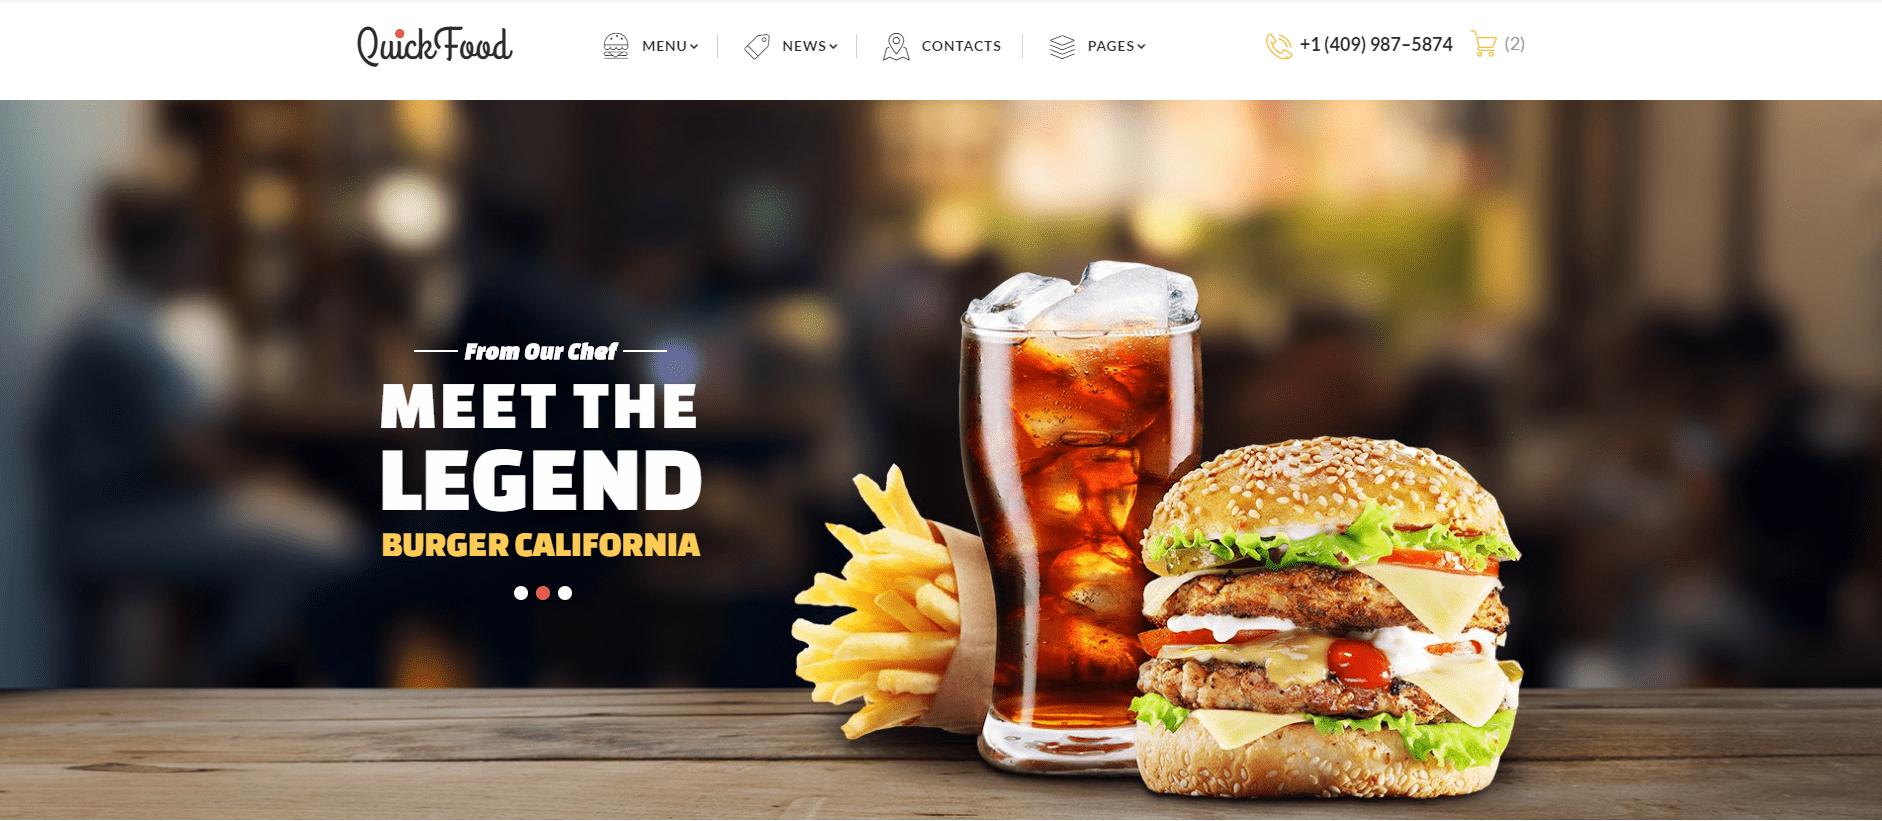 Hamburger Menu: Use In Web and Mobile User Interfaces - image3 2